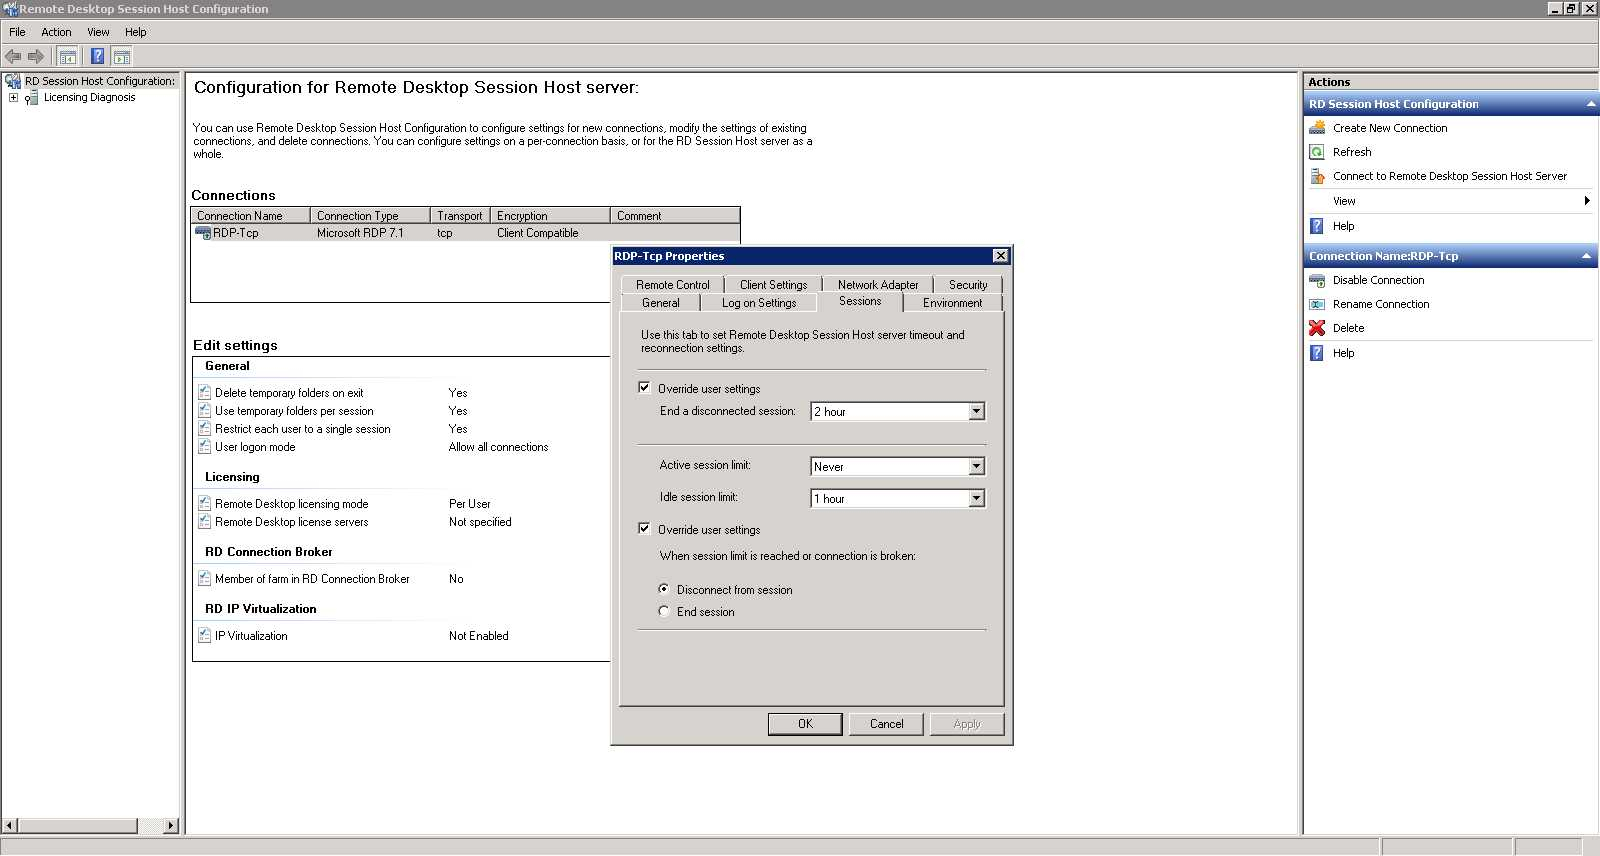 Using Remote Desktop Session Host Configuration in Windows